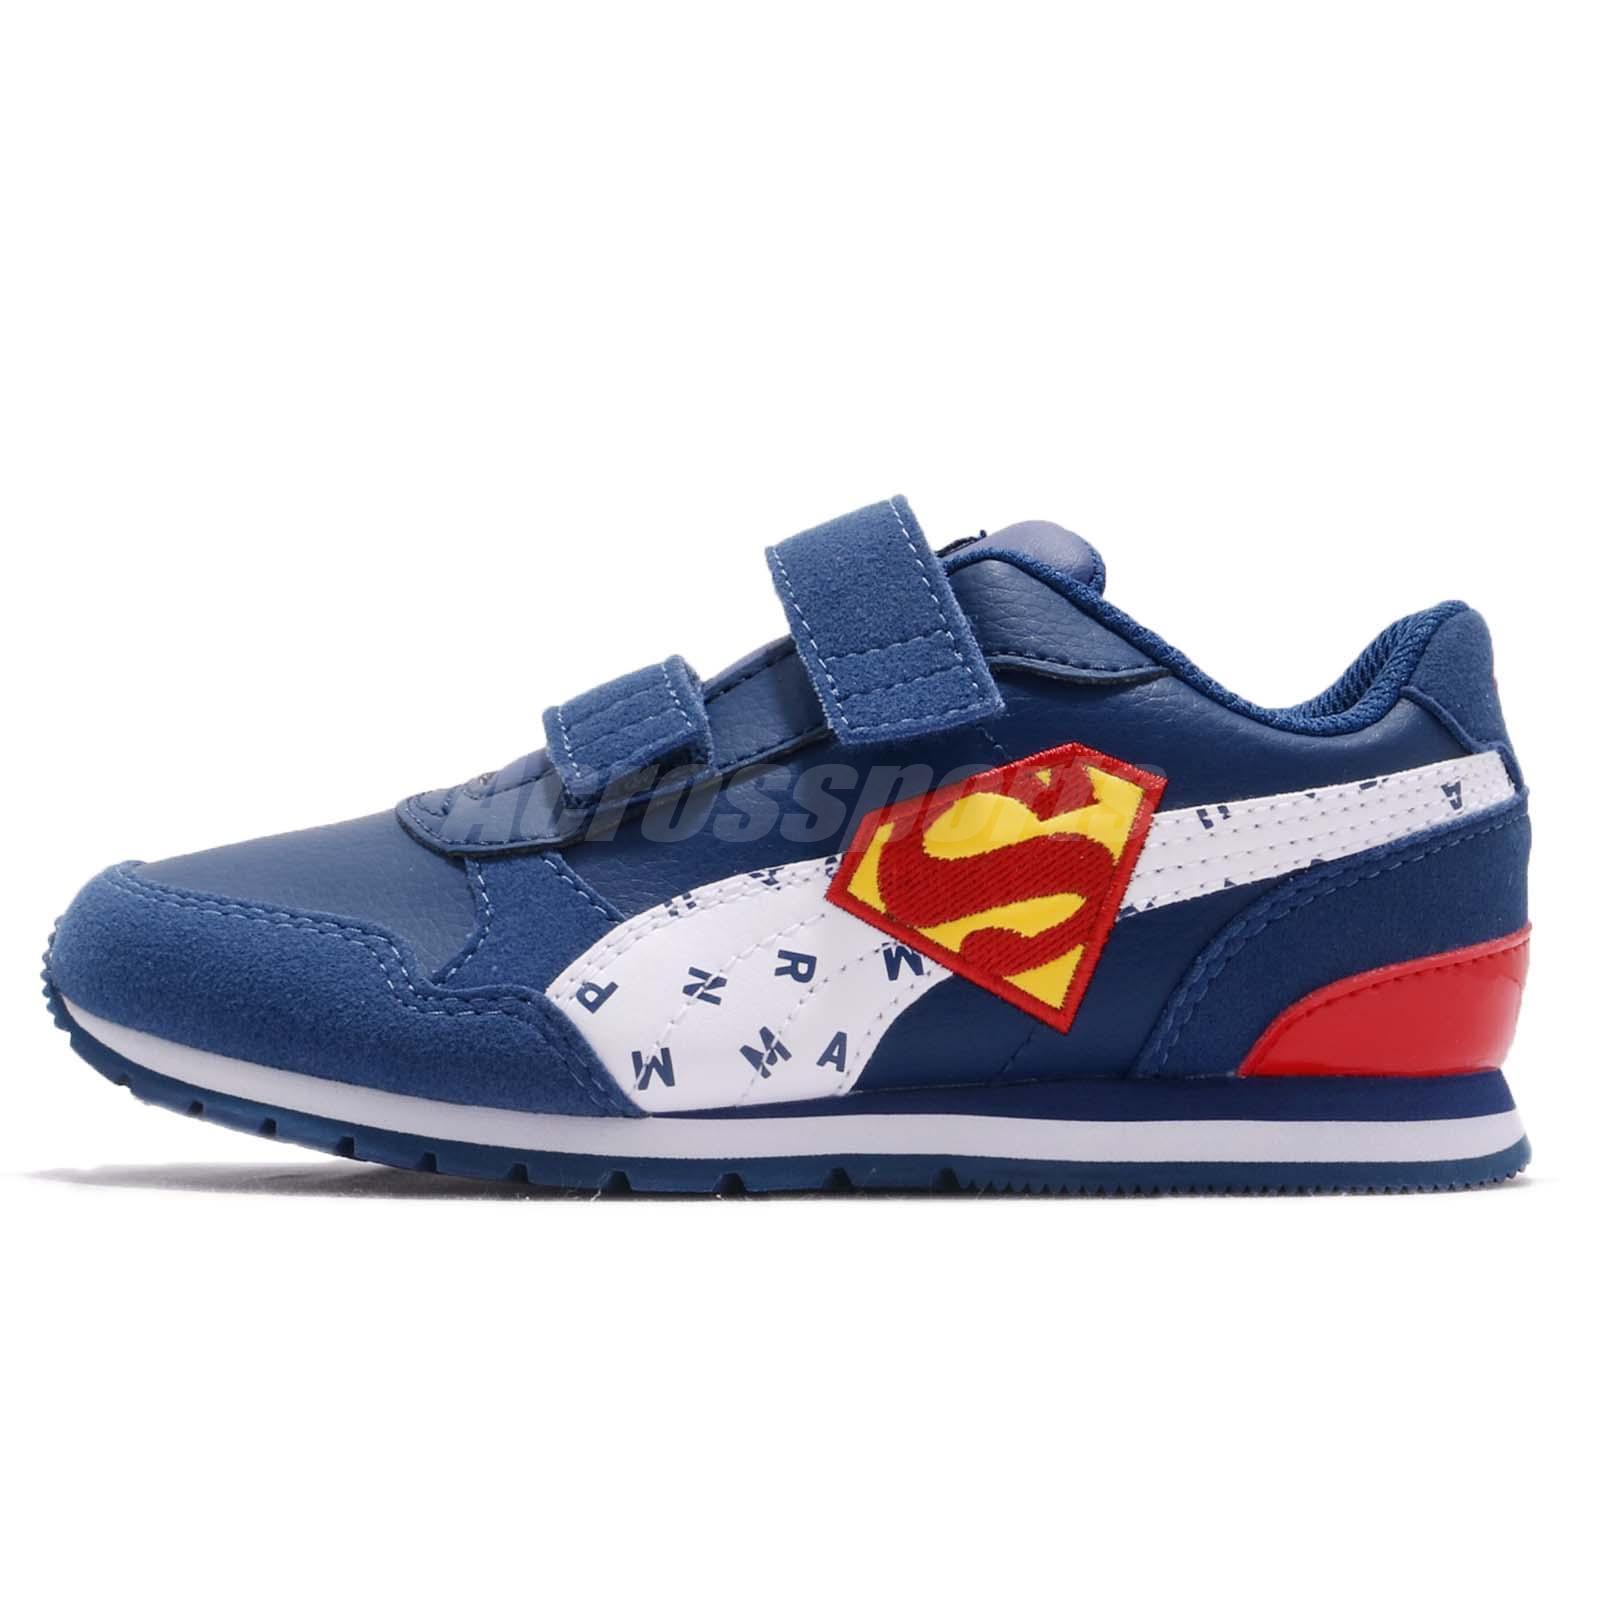 c4d46e36b656b4 Puma JL ST Runner V2 V PS Superman Preschool Kids Running Shoes 366741-02